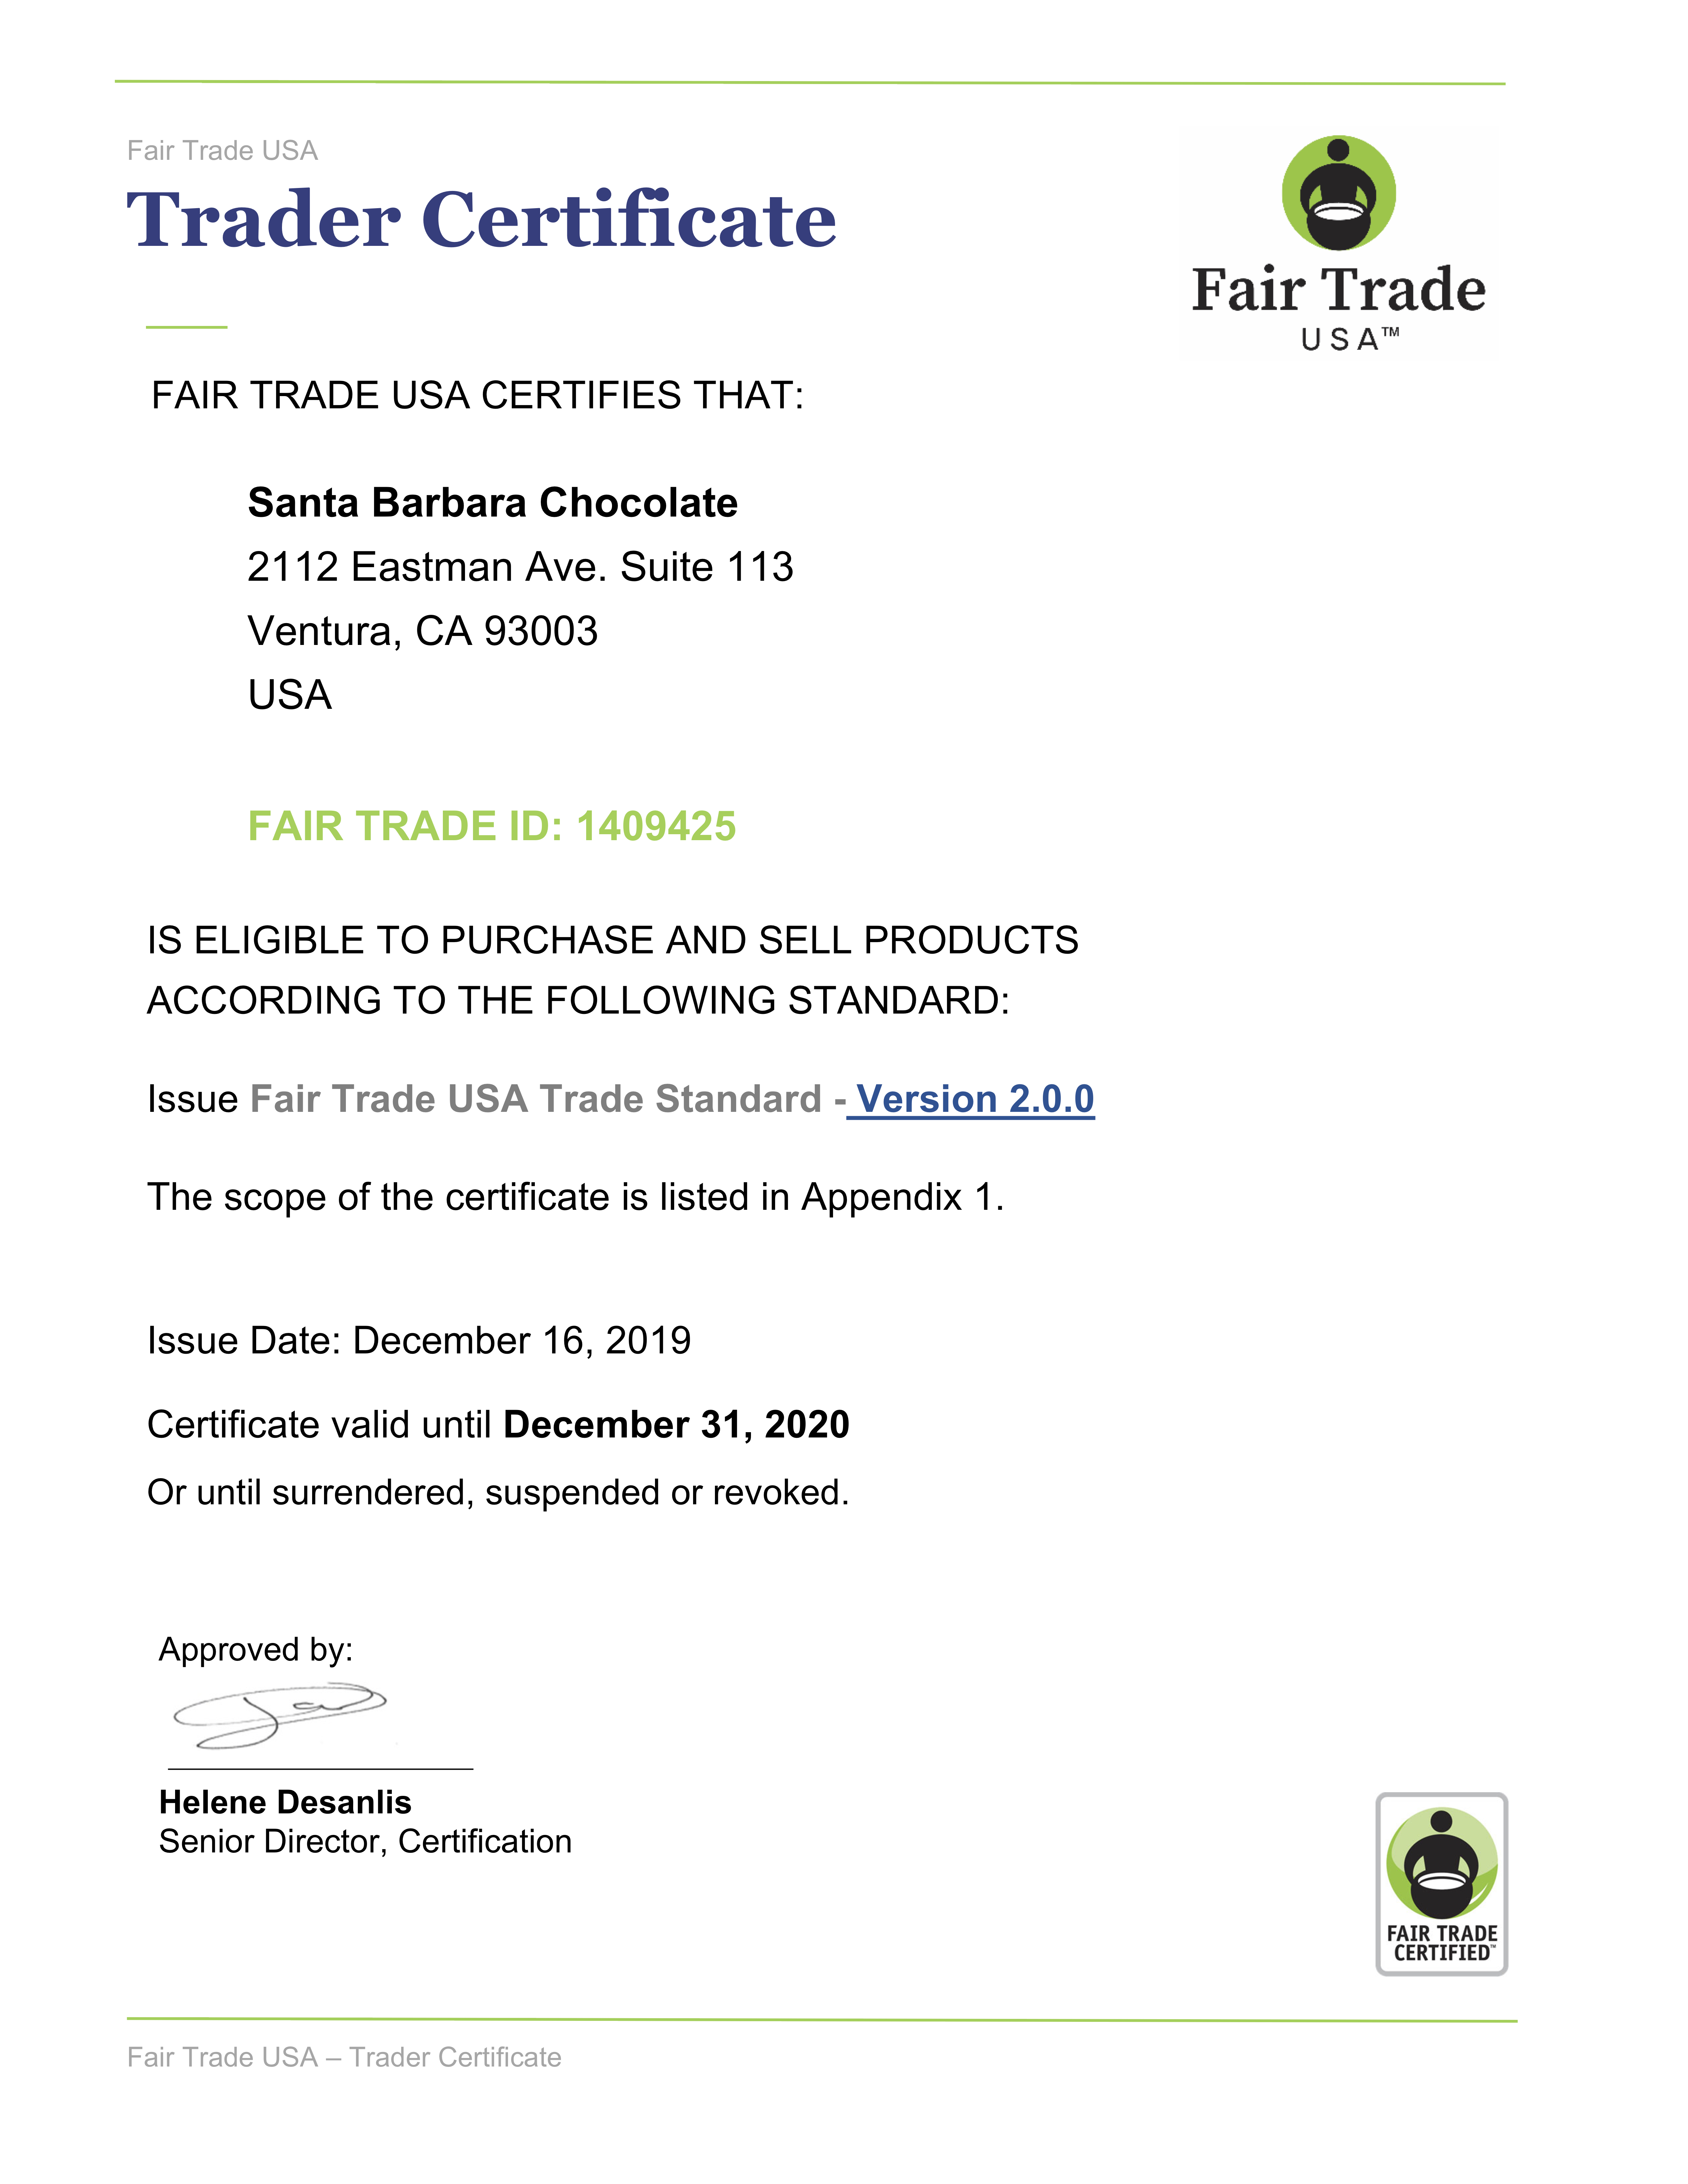 fair-trade-usa-2020-trader-certificate-1.jpg